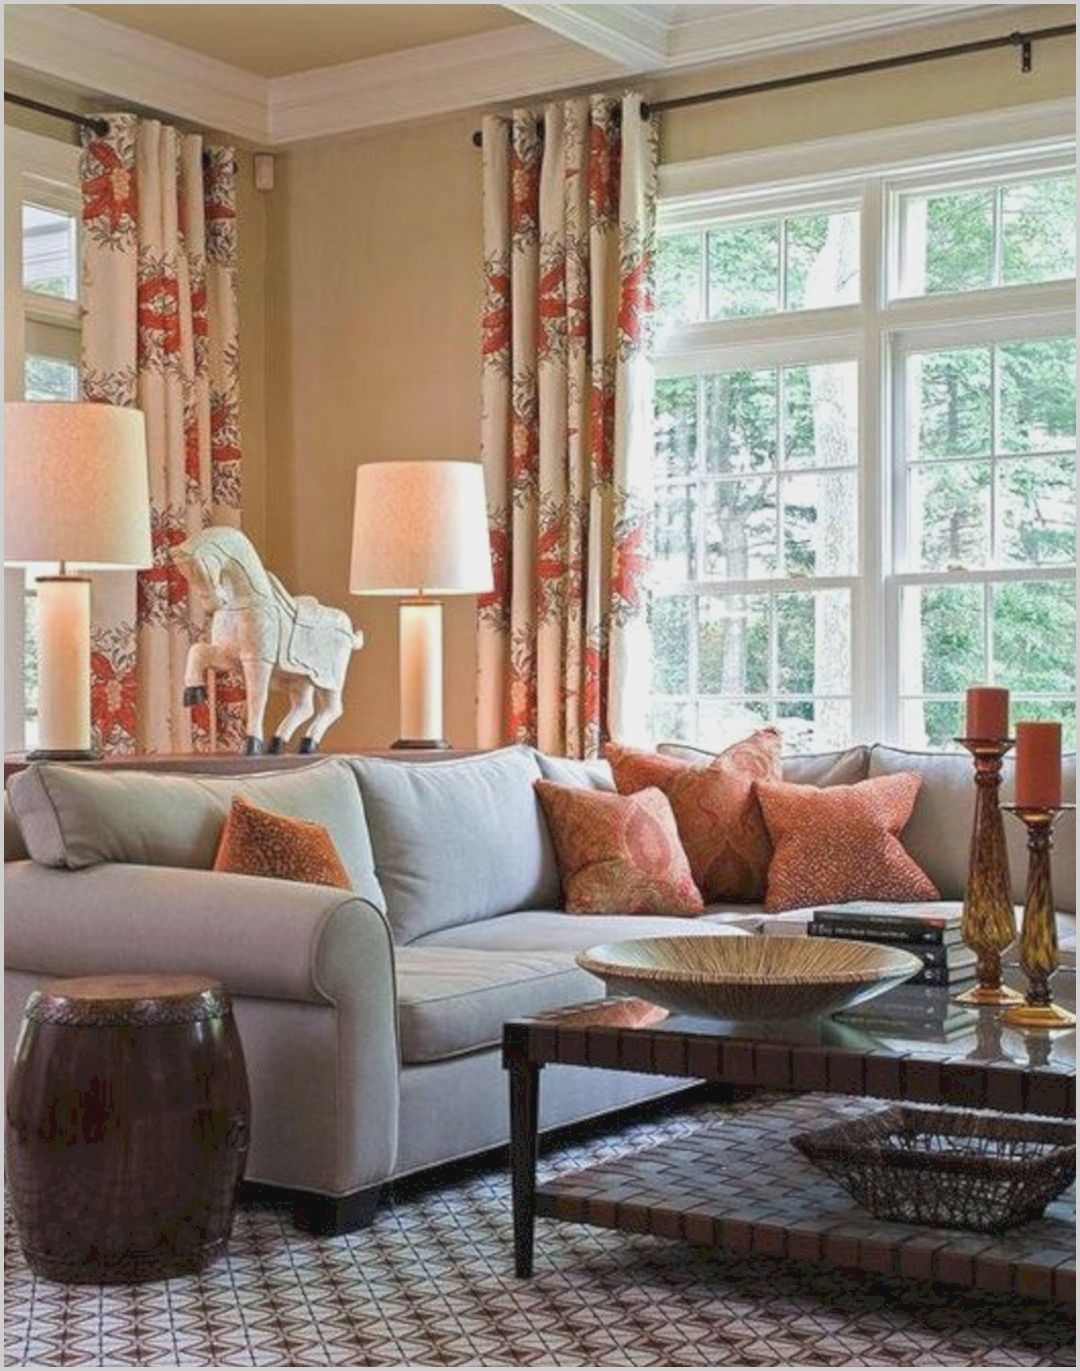 Grey orange and Teal Living Room in 2020 | Living room ...